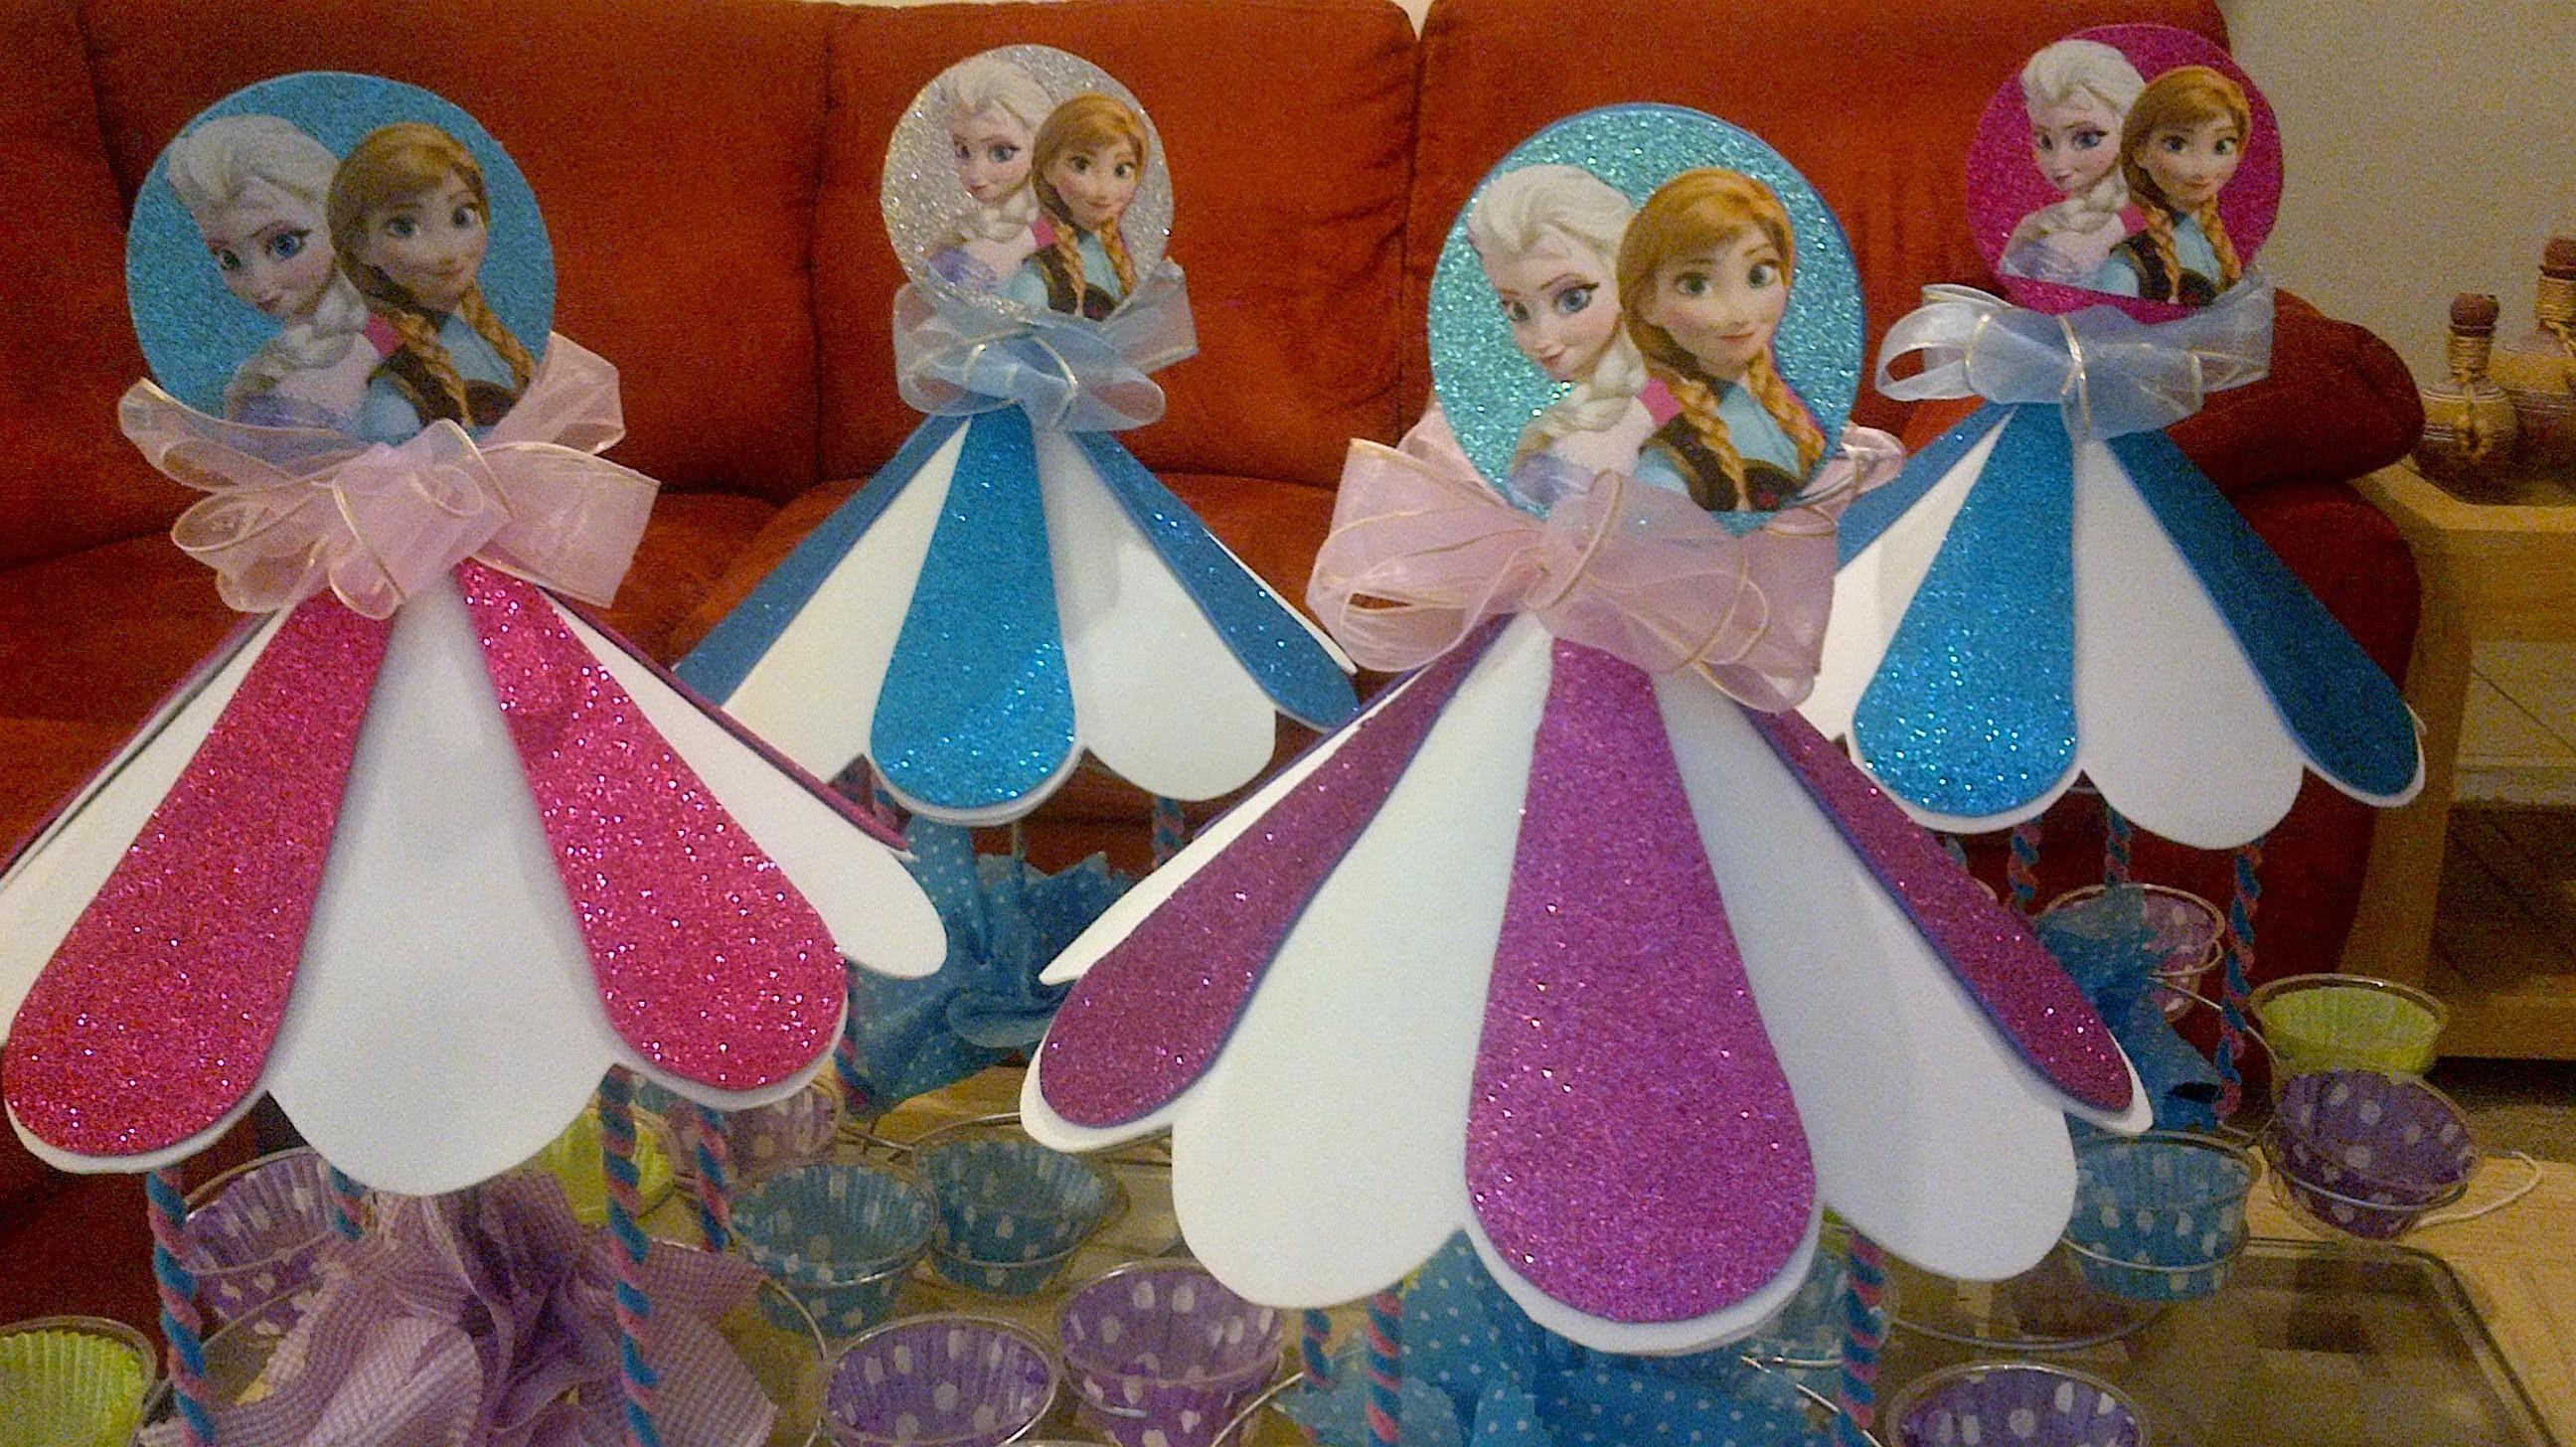 Fiesta de frozen elsa y anna. frozen party!